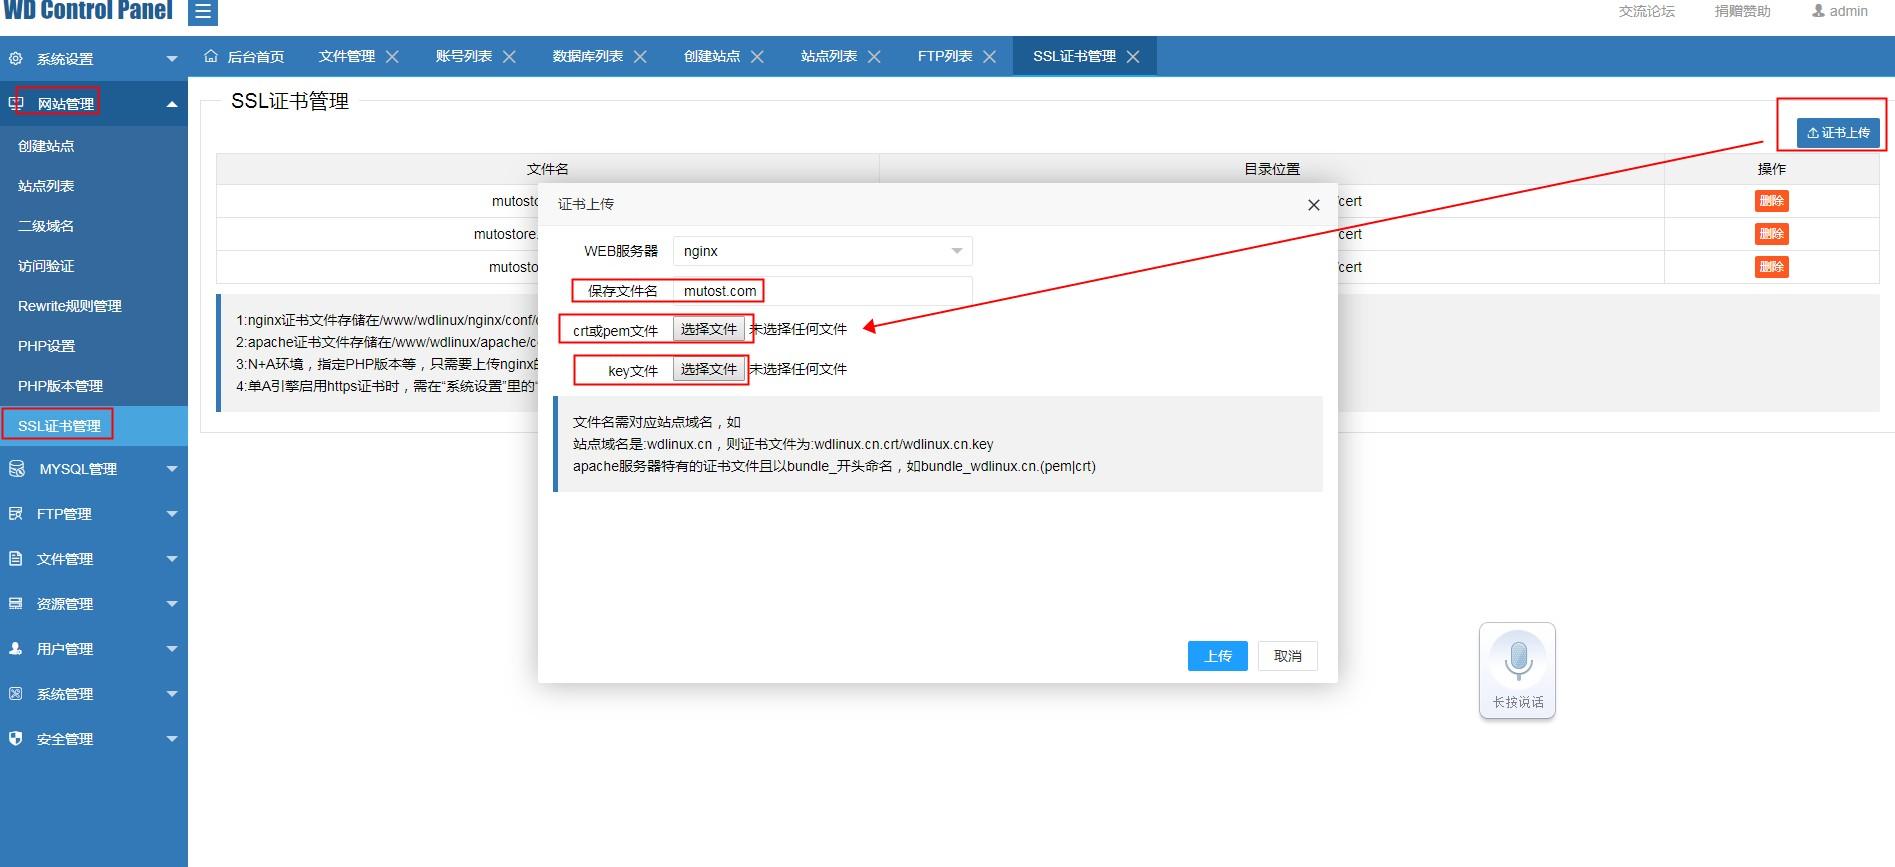 wdcp服务器管理面板安装SSL证书